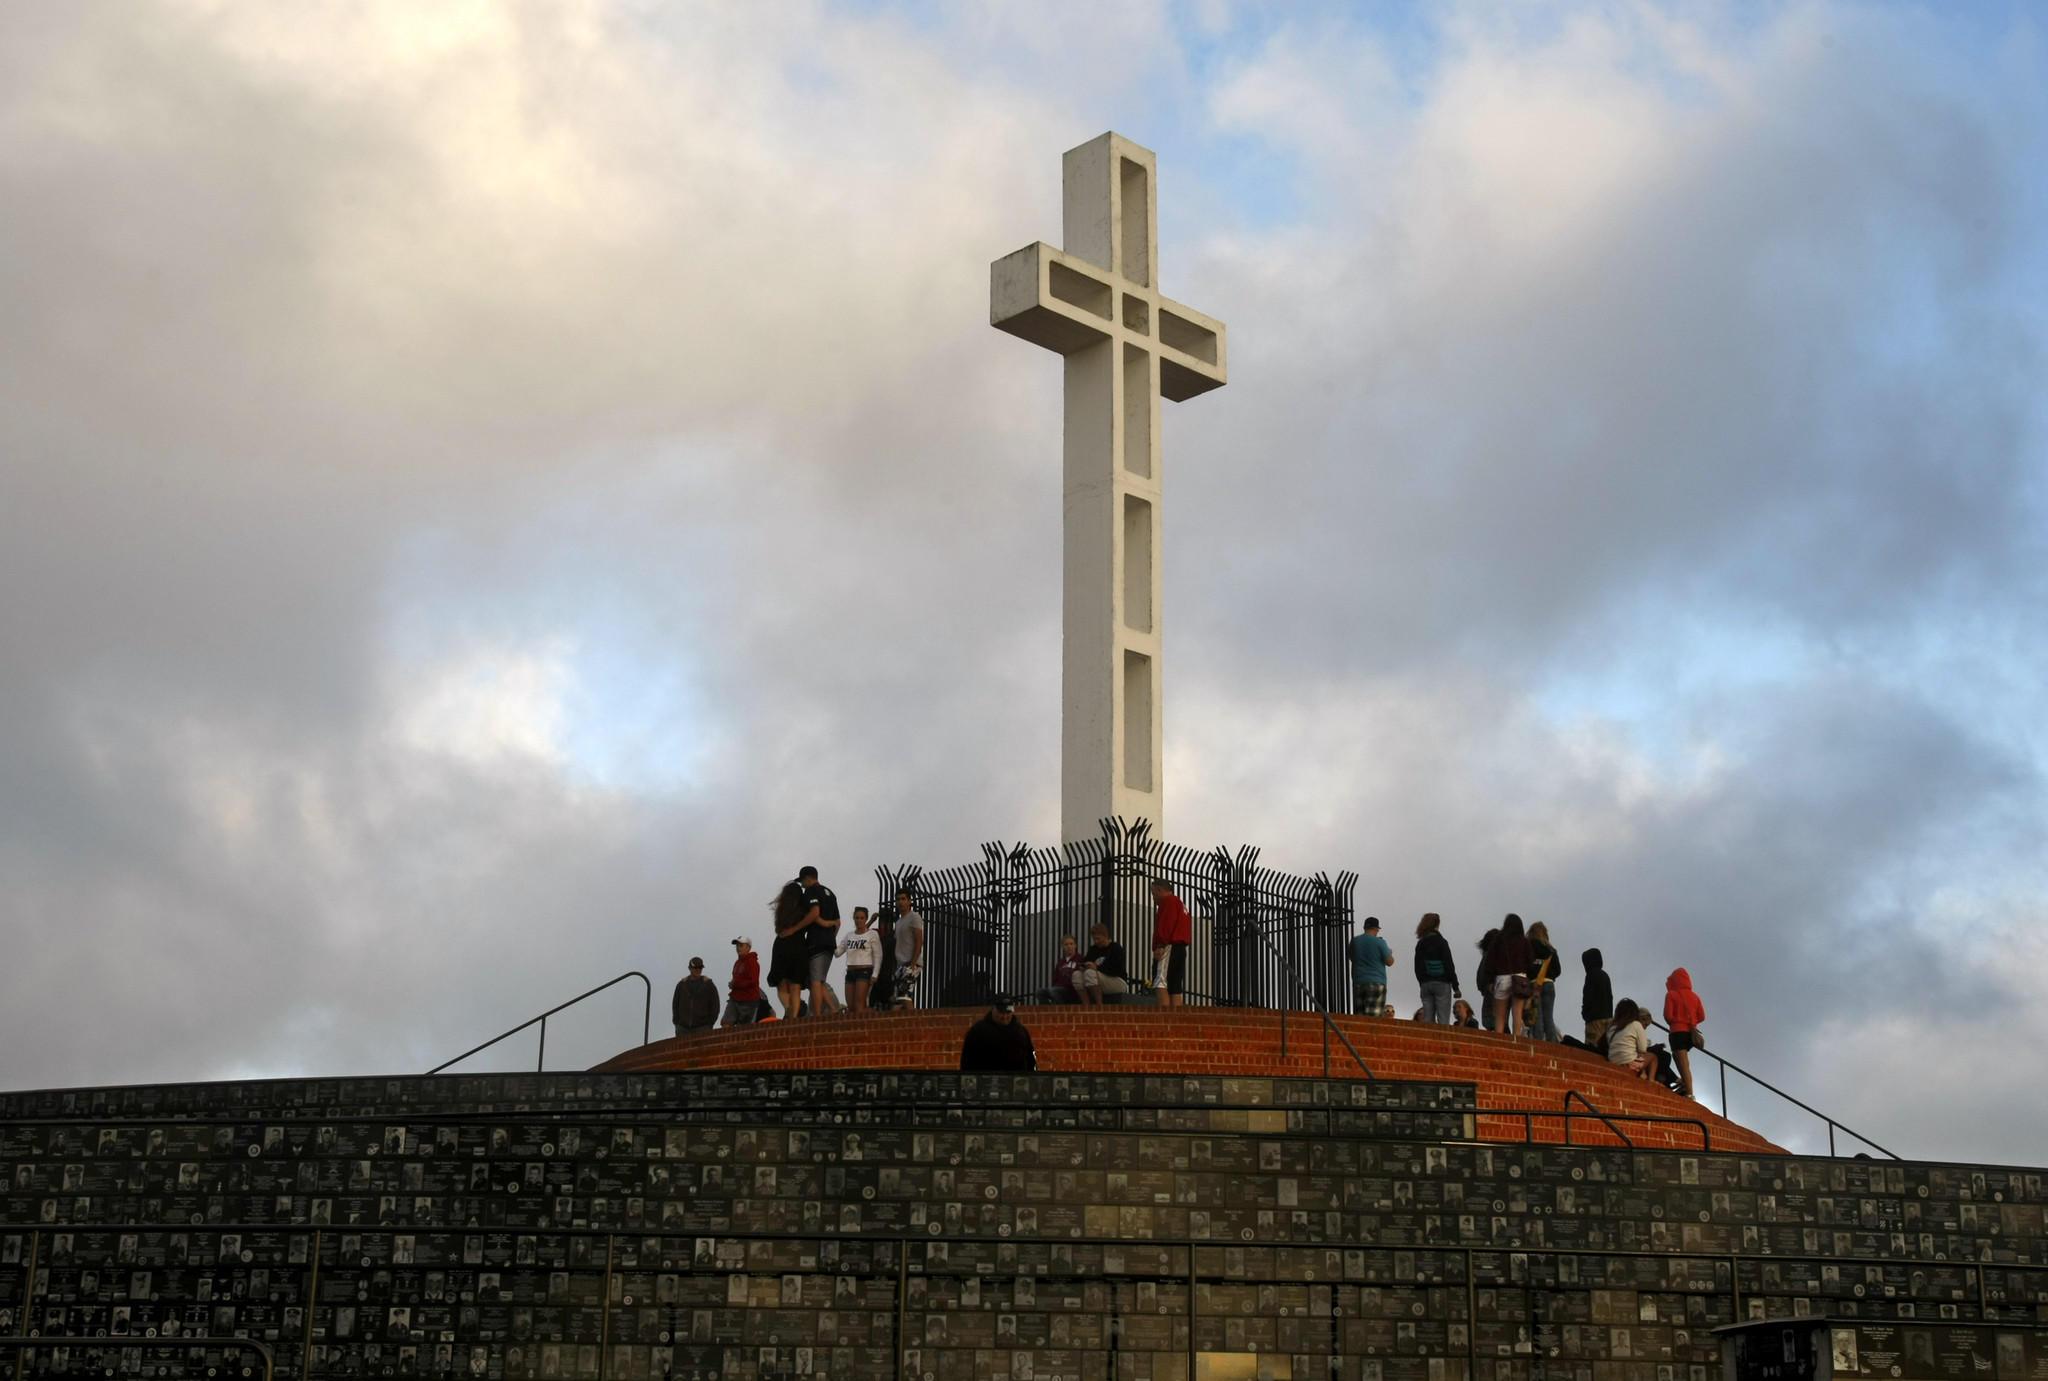 The cross atop Mt. Soledad in San Diego.